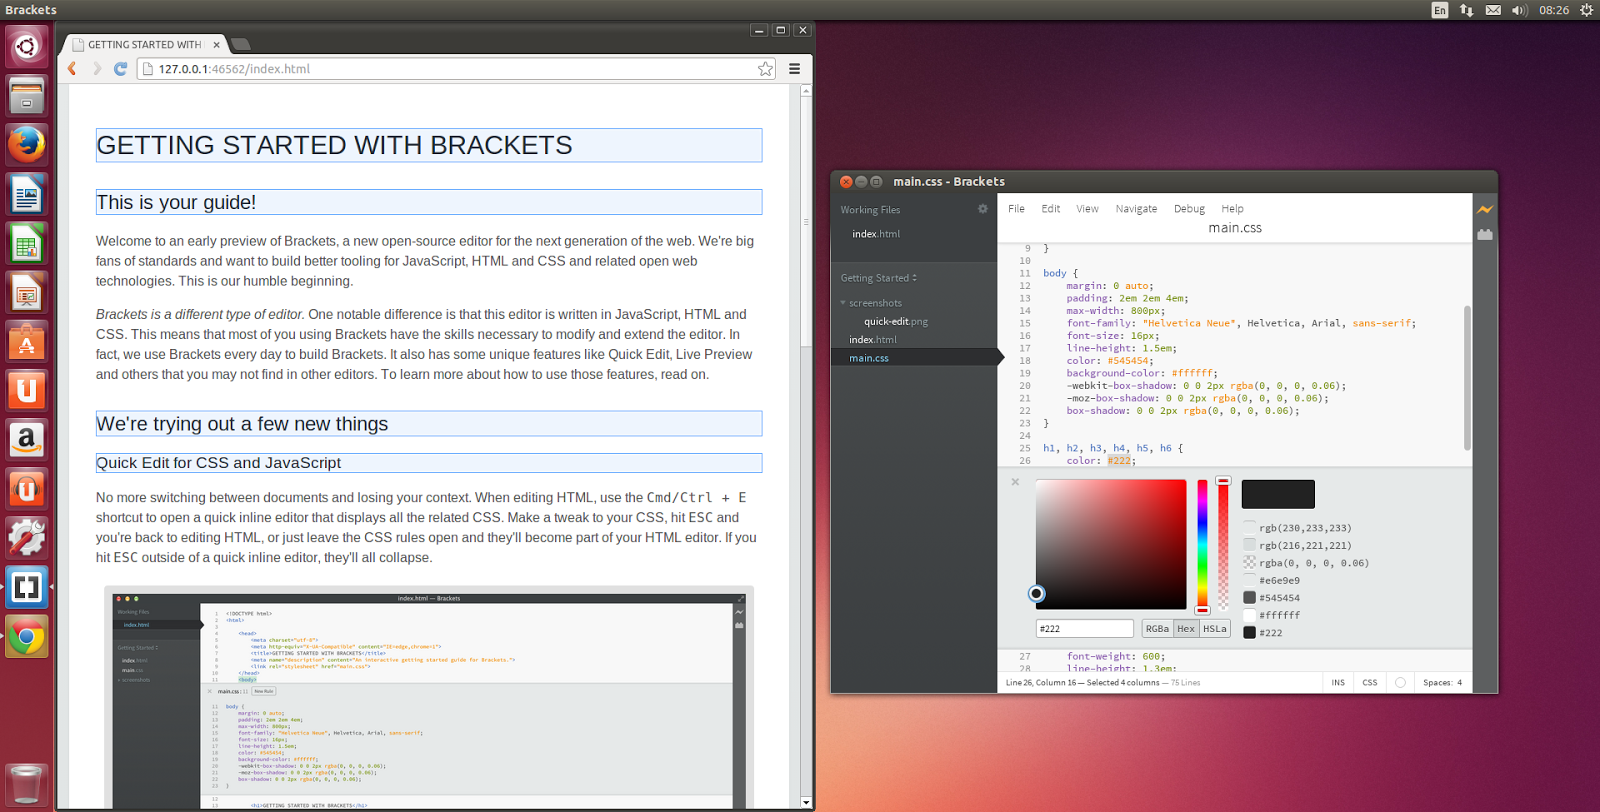 Tampilan Brackets di Linux (Ubuntu)